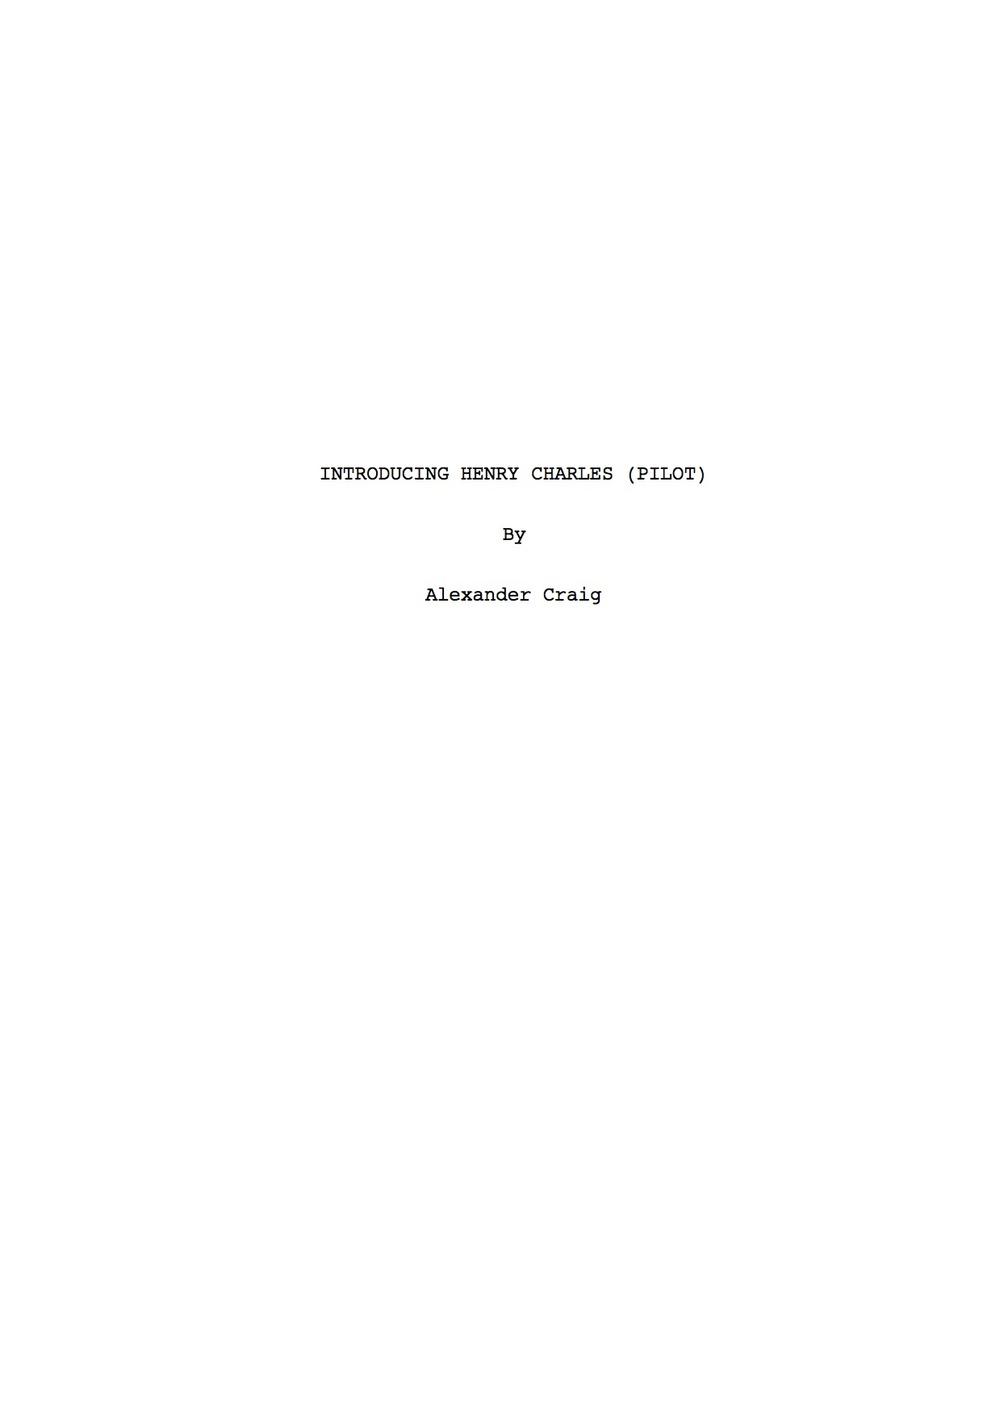 'Introducing Henry Charles' (Pilot) by Alexander Craig | T.jpg